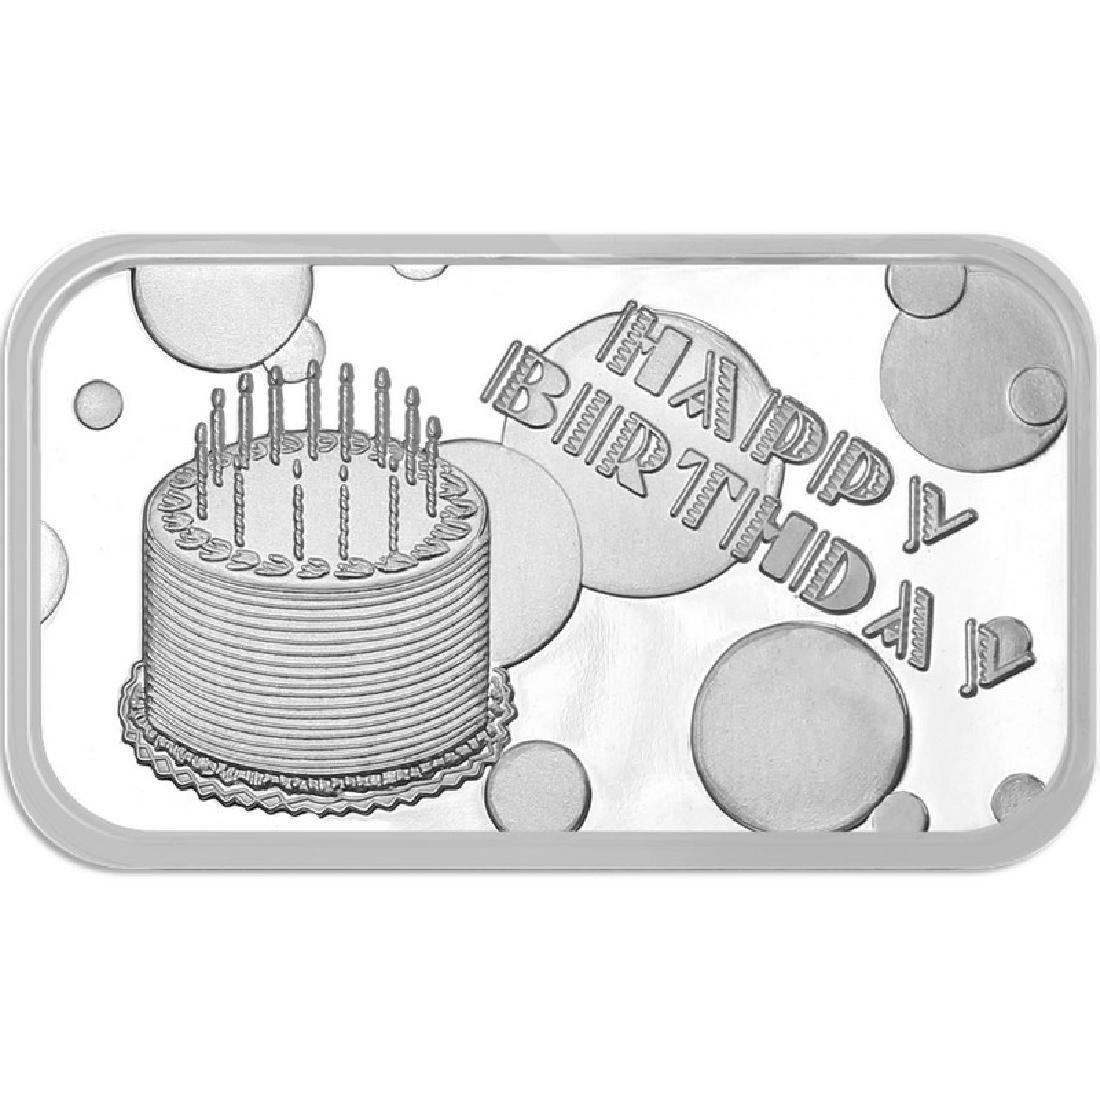 Happy Birthday Cake 2018 .999 Silver 1 oz Bar